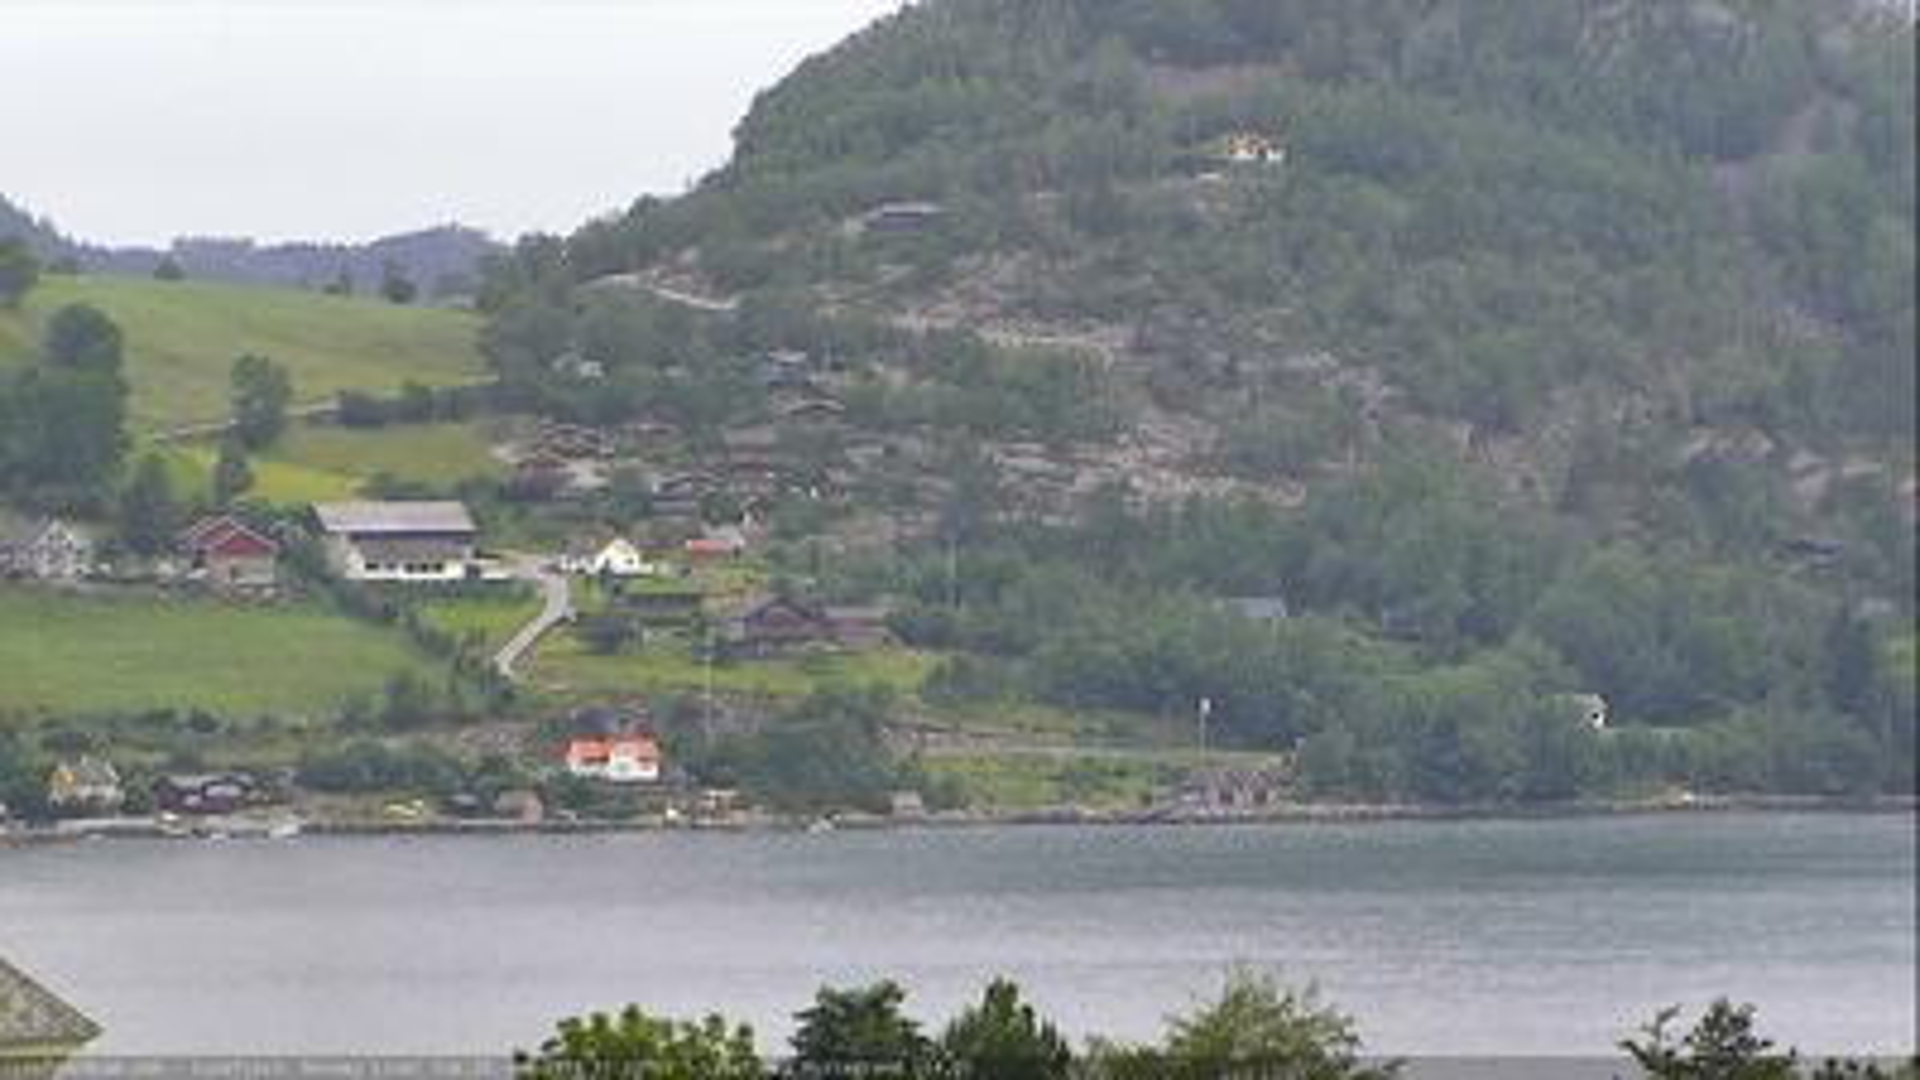 Webkamera Hagen: Lysefjord − Lysefjord Hyttegrend rental cot